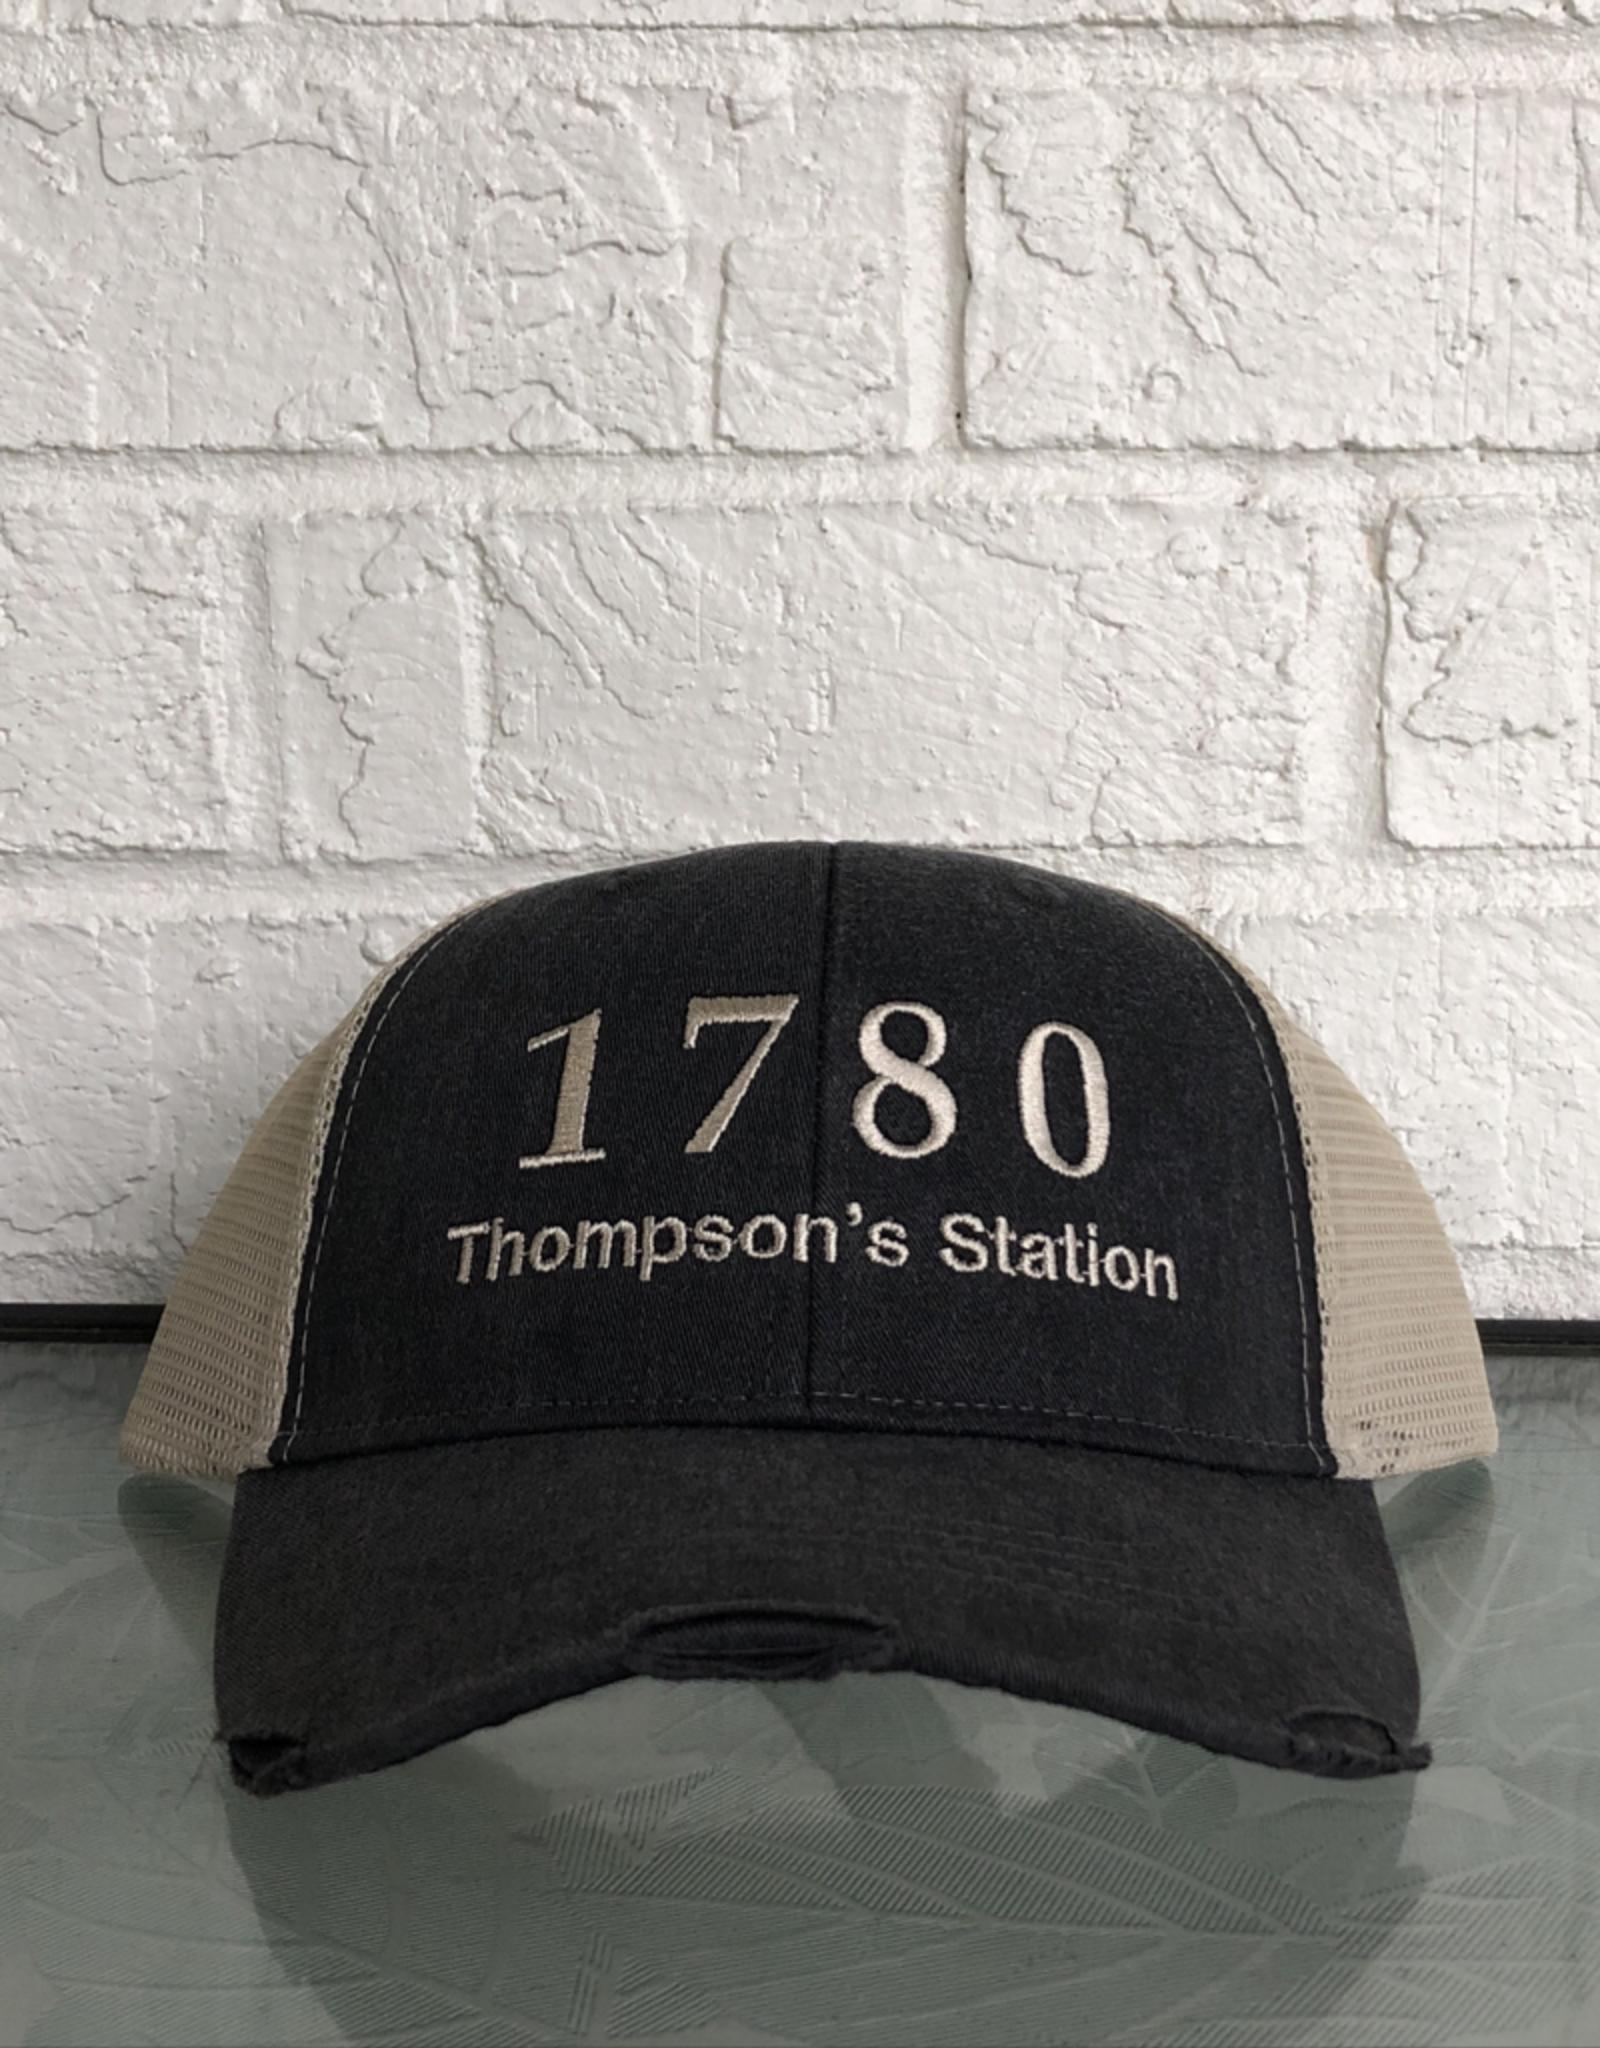 Thompson's Station 1780 Trucker Cap